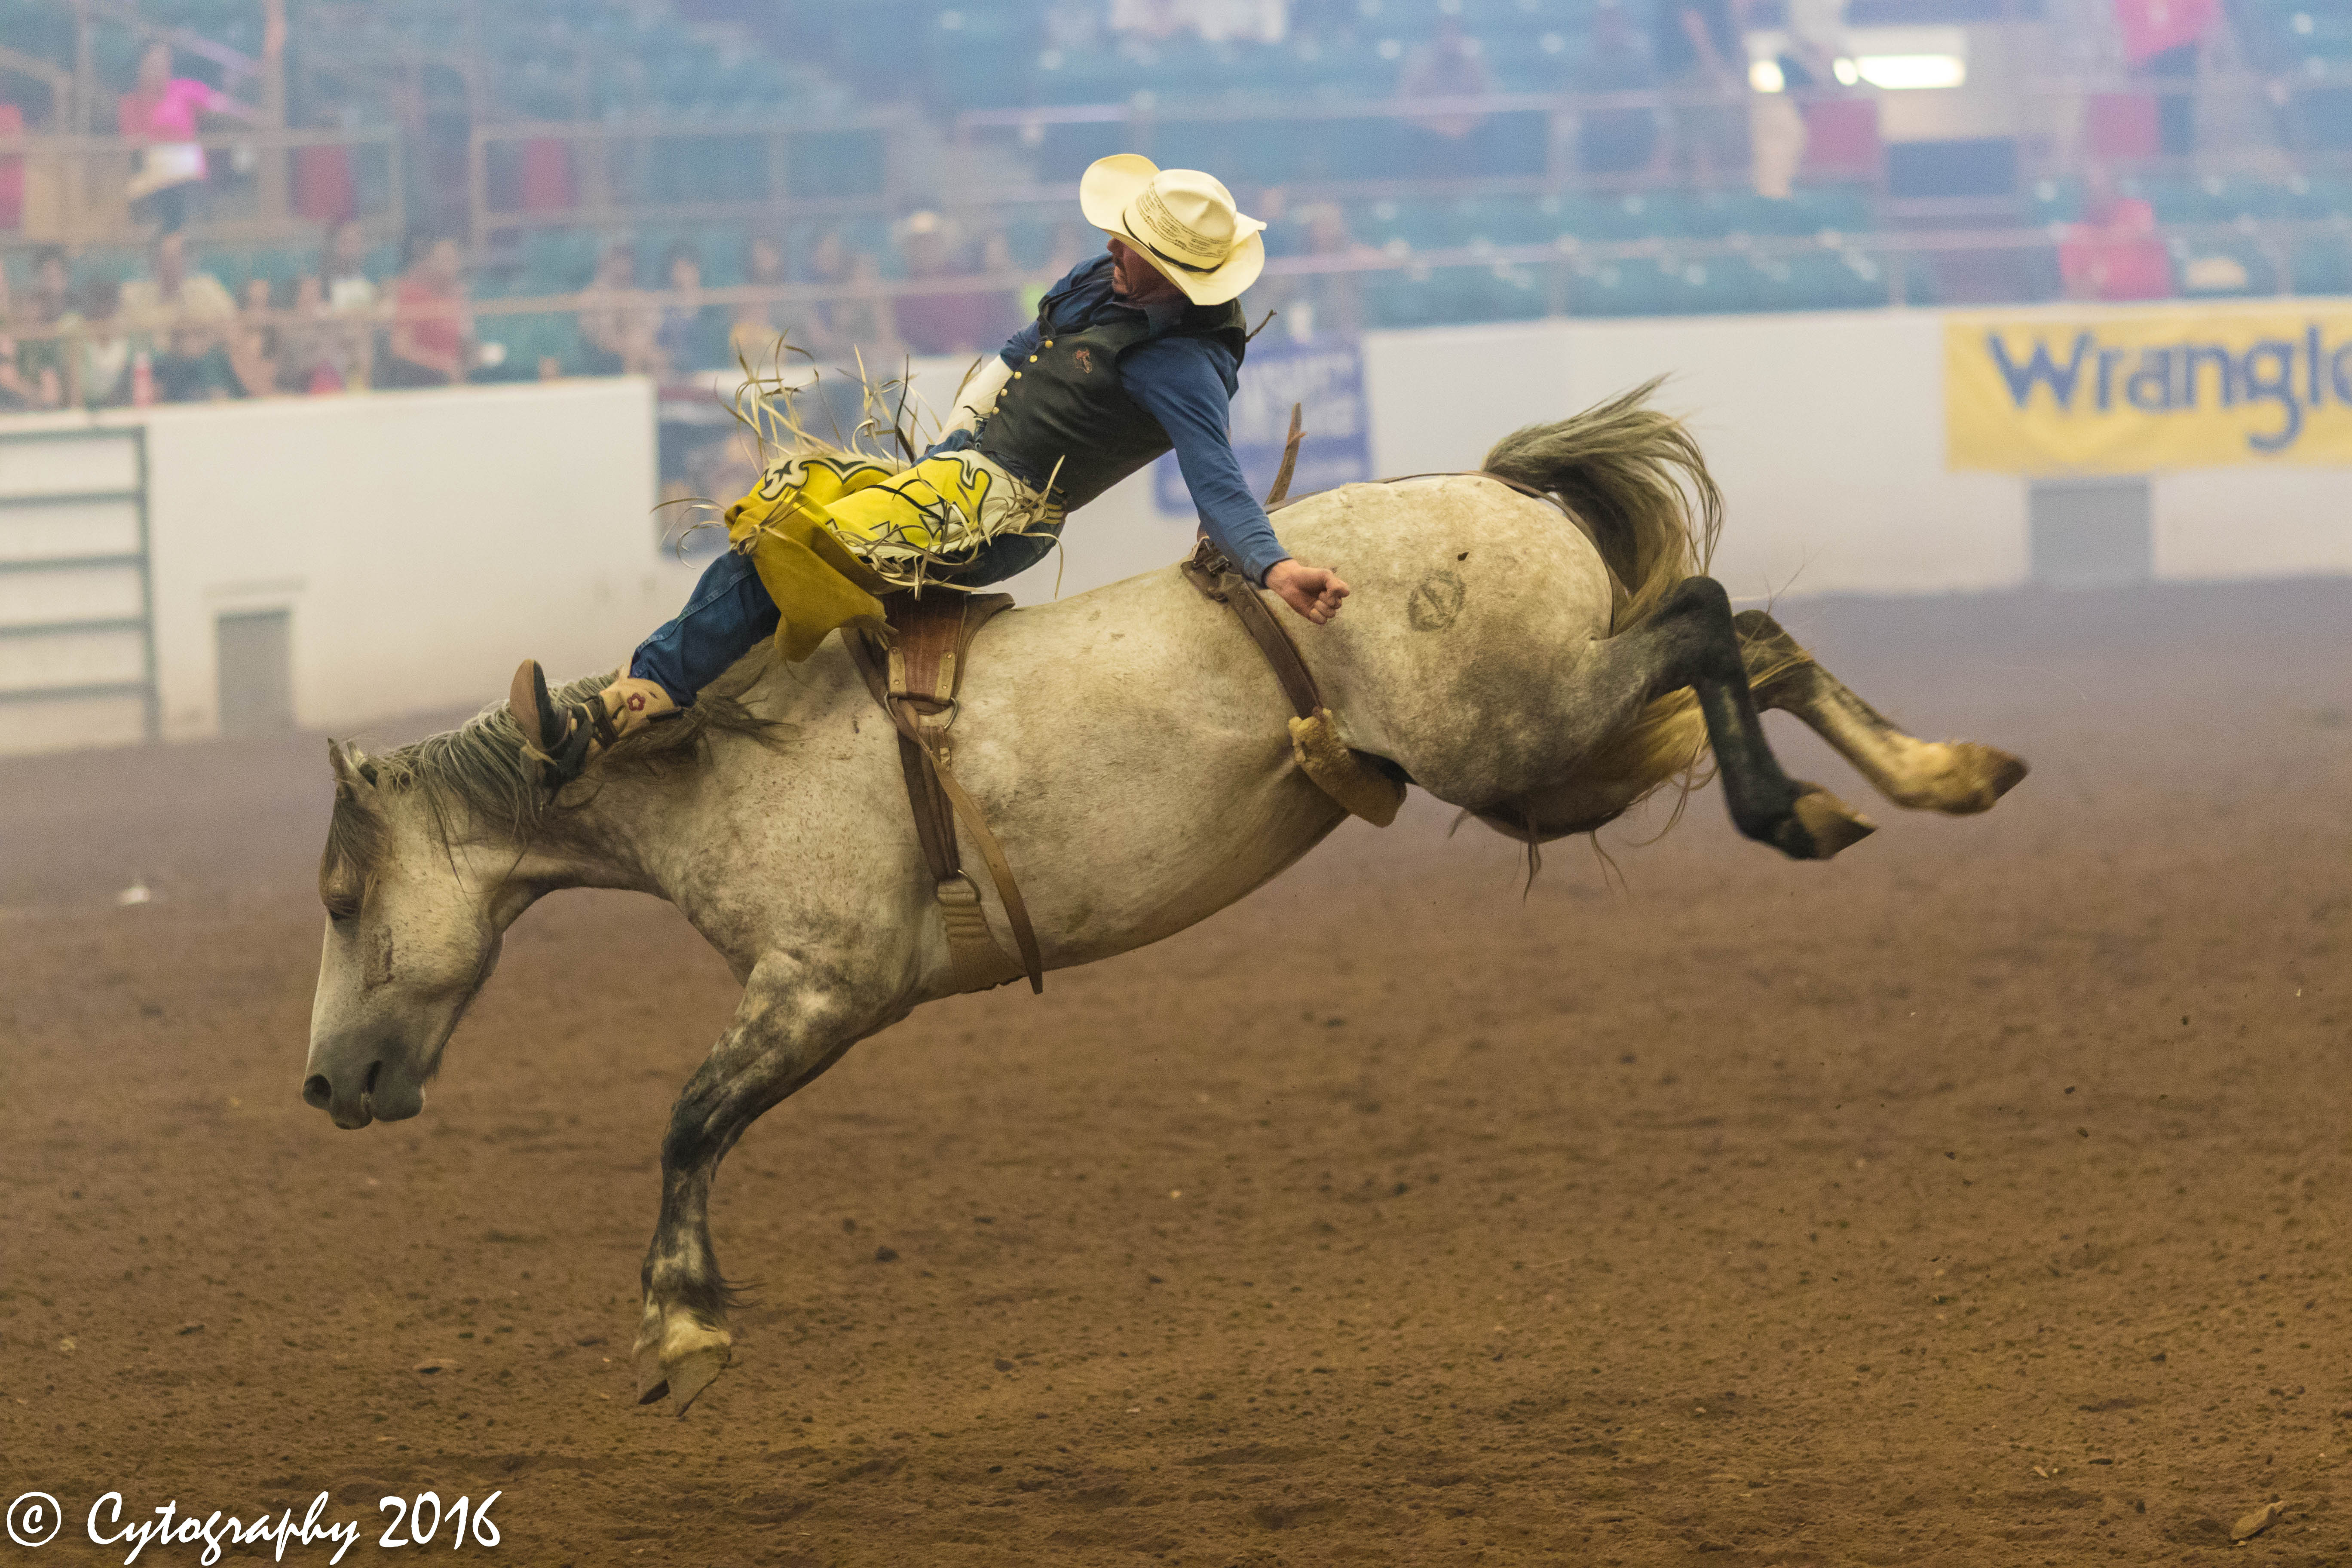 Rodeo2017-1.jpg